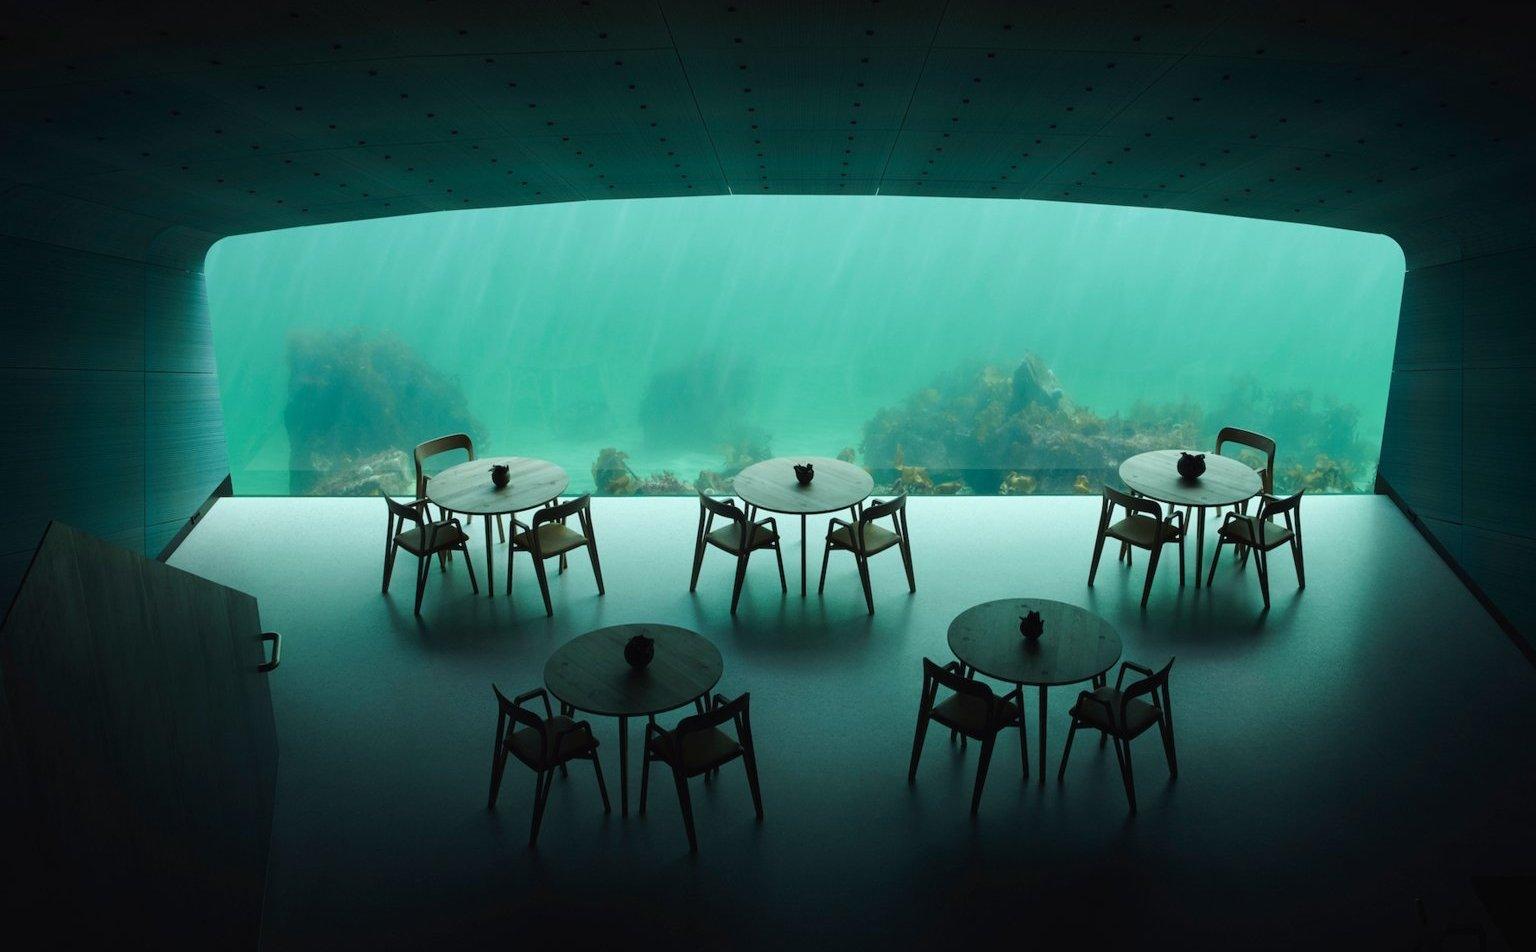 Đang tải tinhte_under_biggest_restaurant_14.jpg…